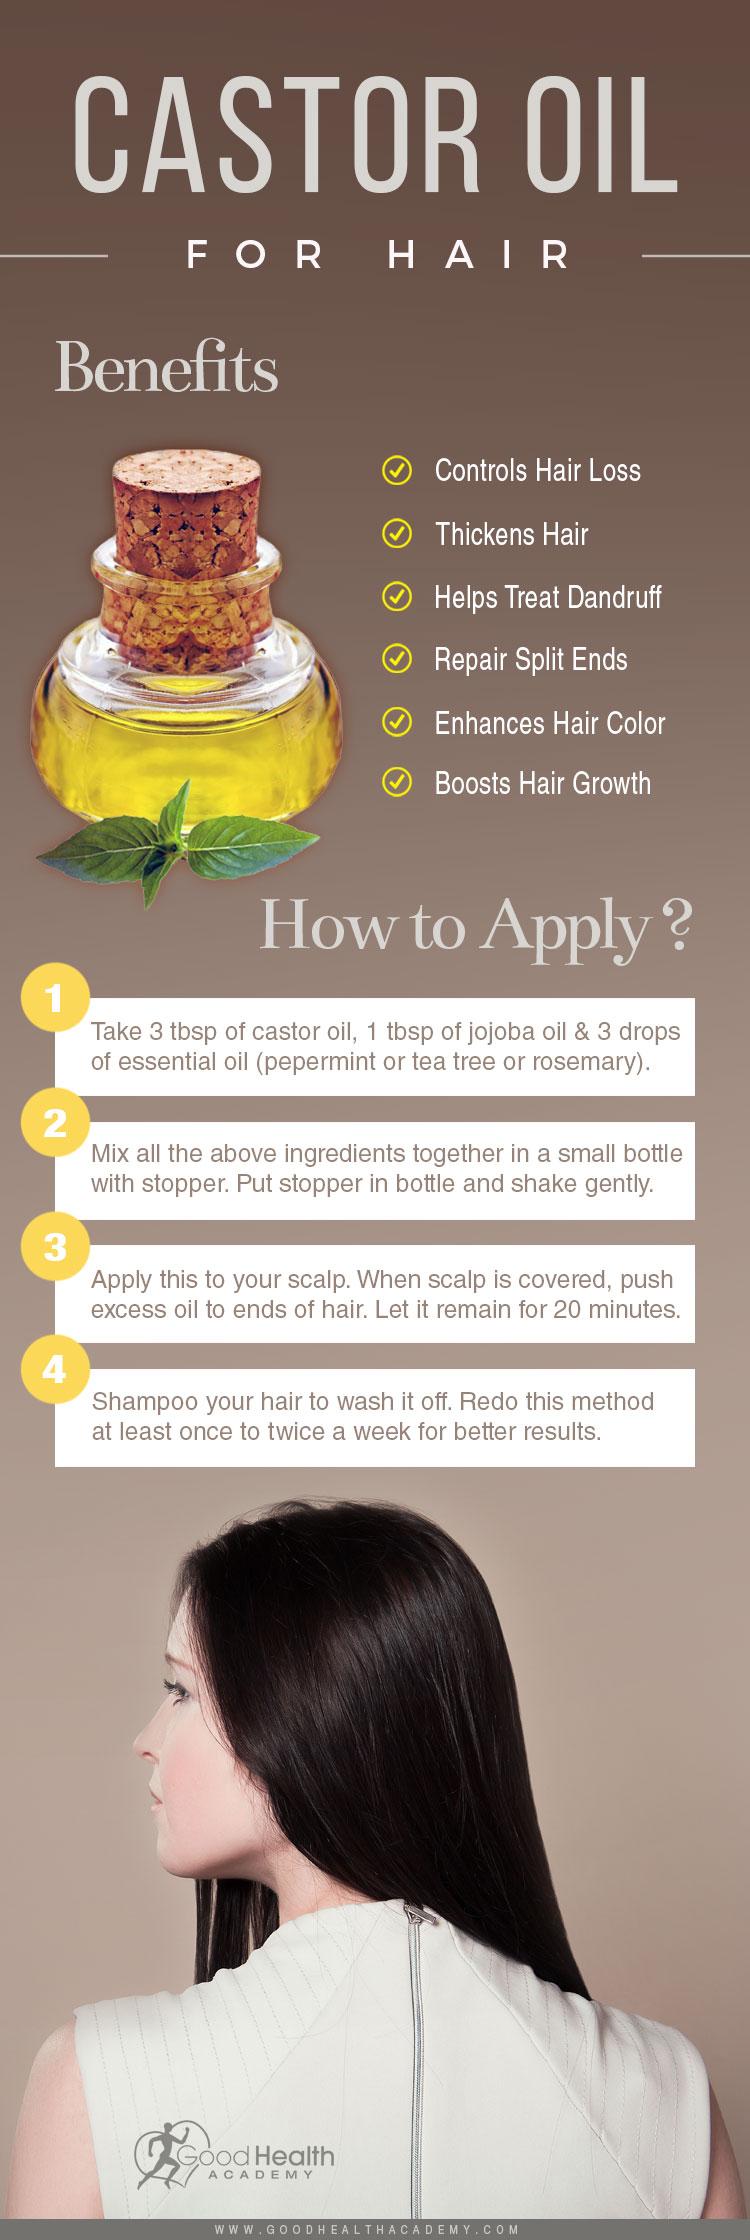 How to apply Castor oil on Hair